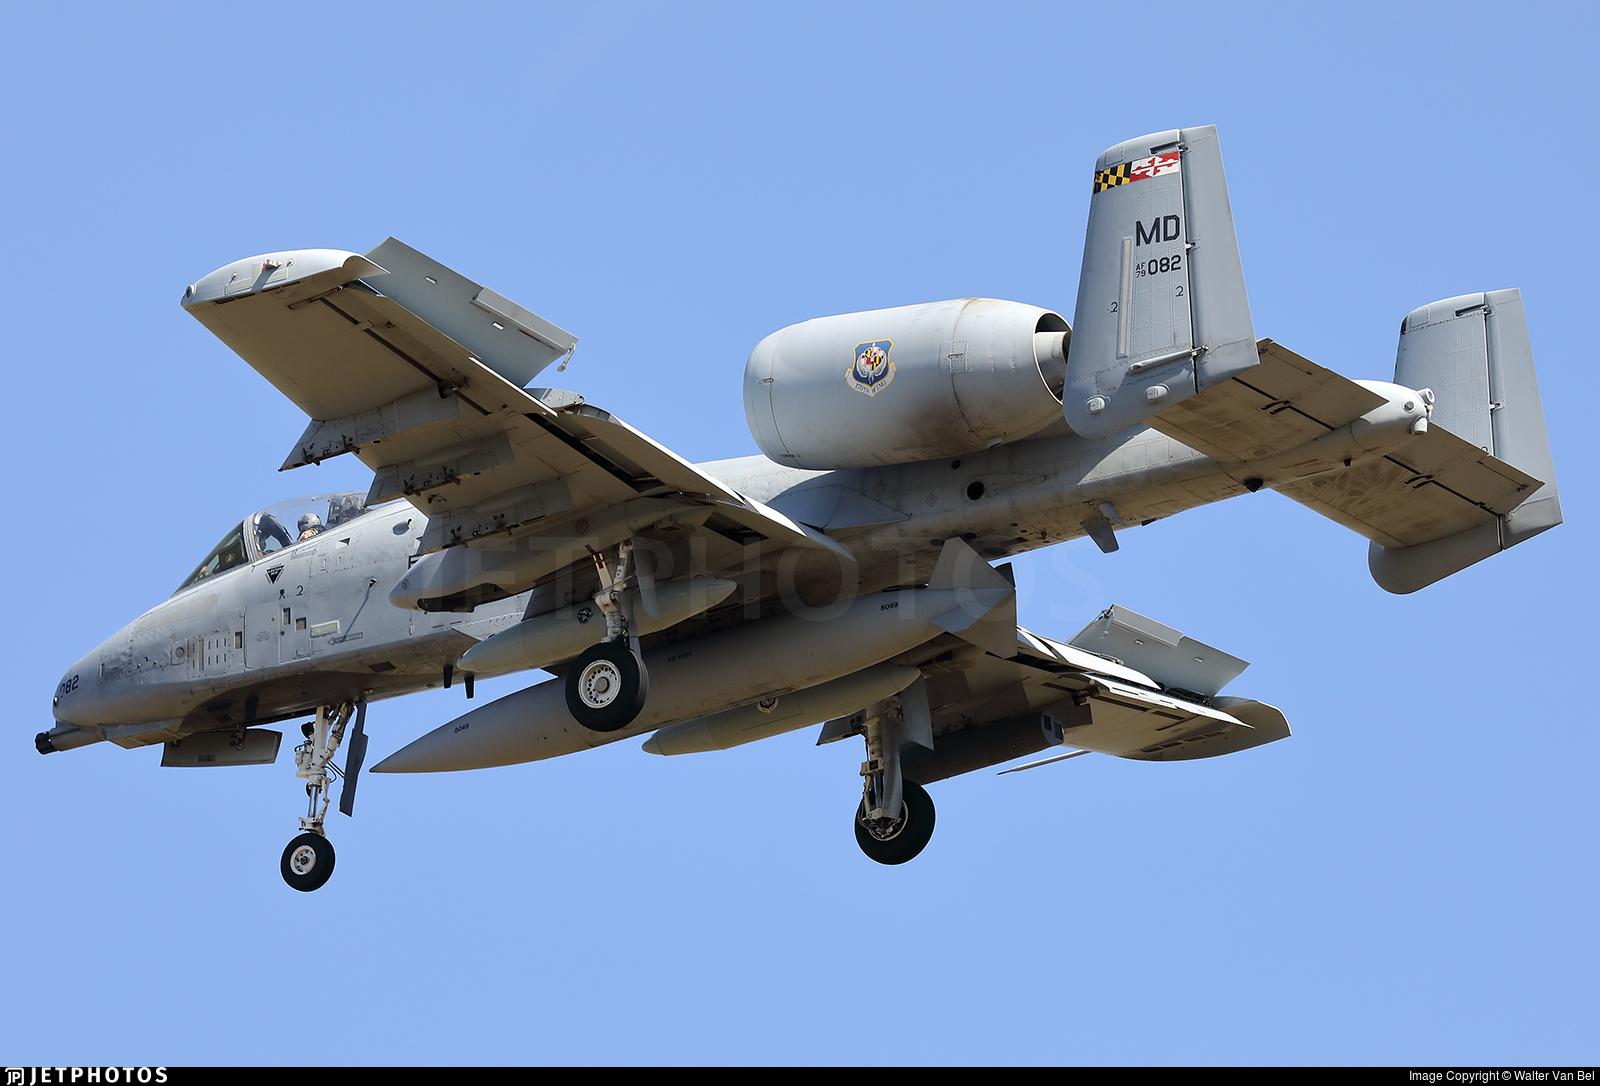 79-0082 - Fairchild A-10C Thunderbolt II - United States - US Air Force (USAF)